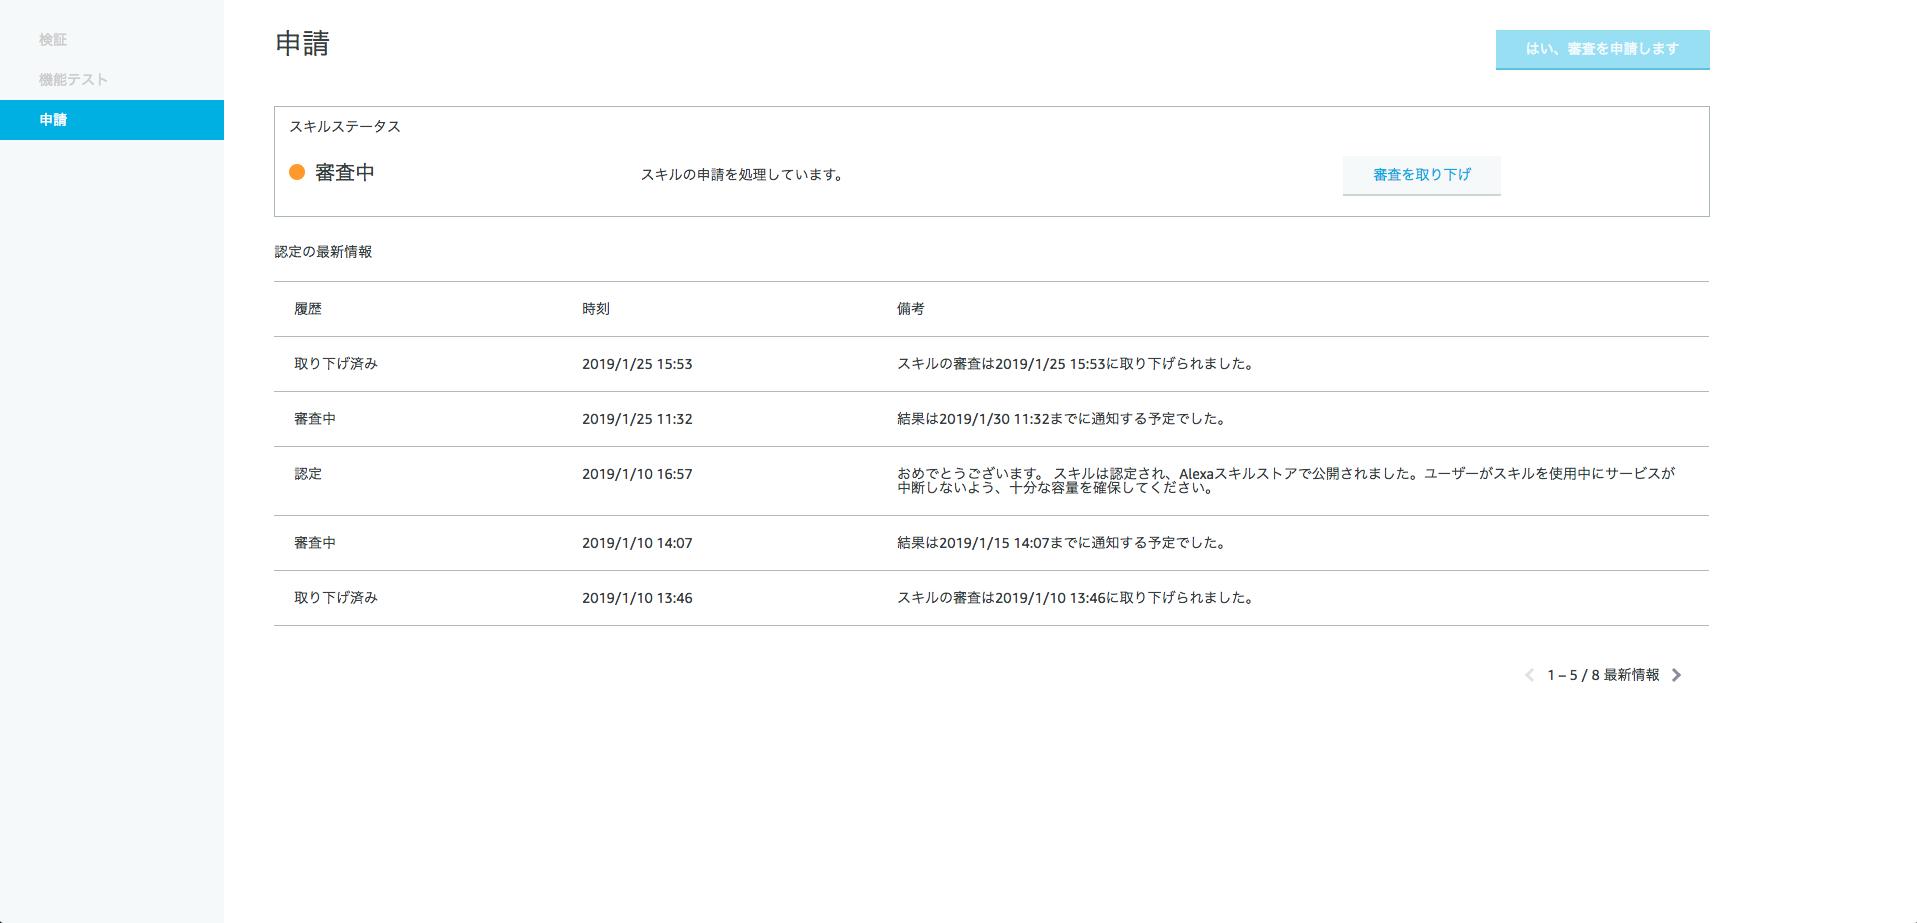 ASK開発者コンソールの申請ページ